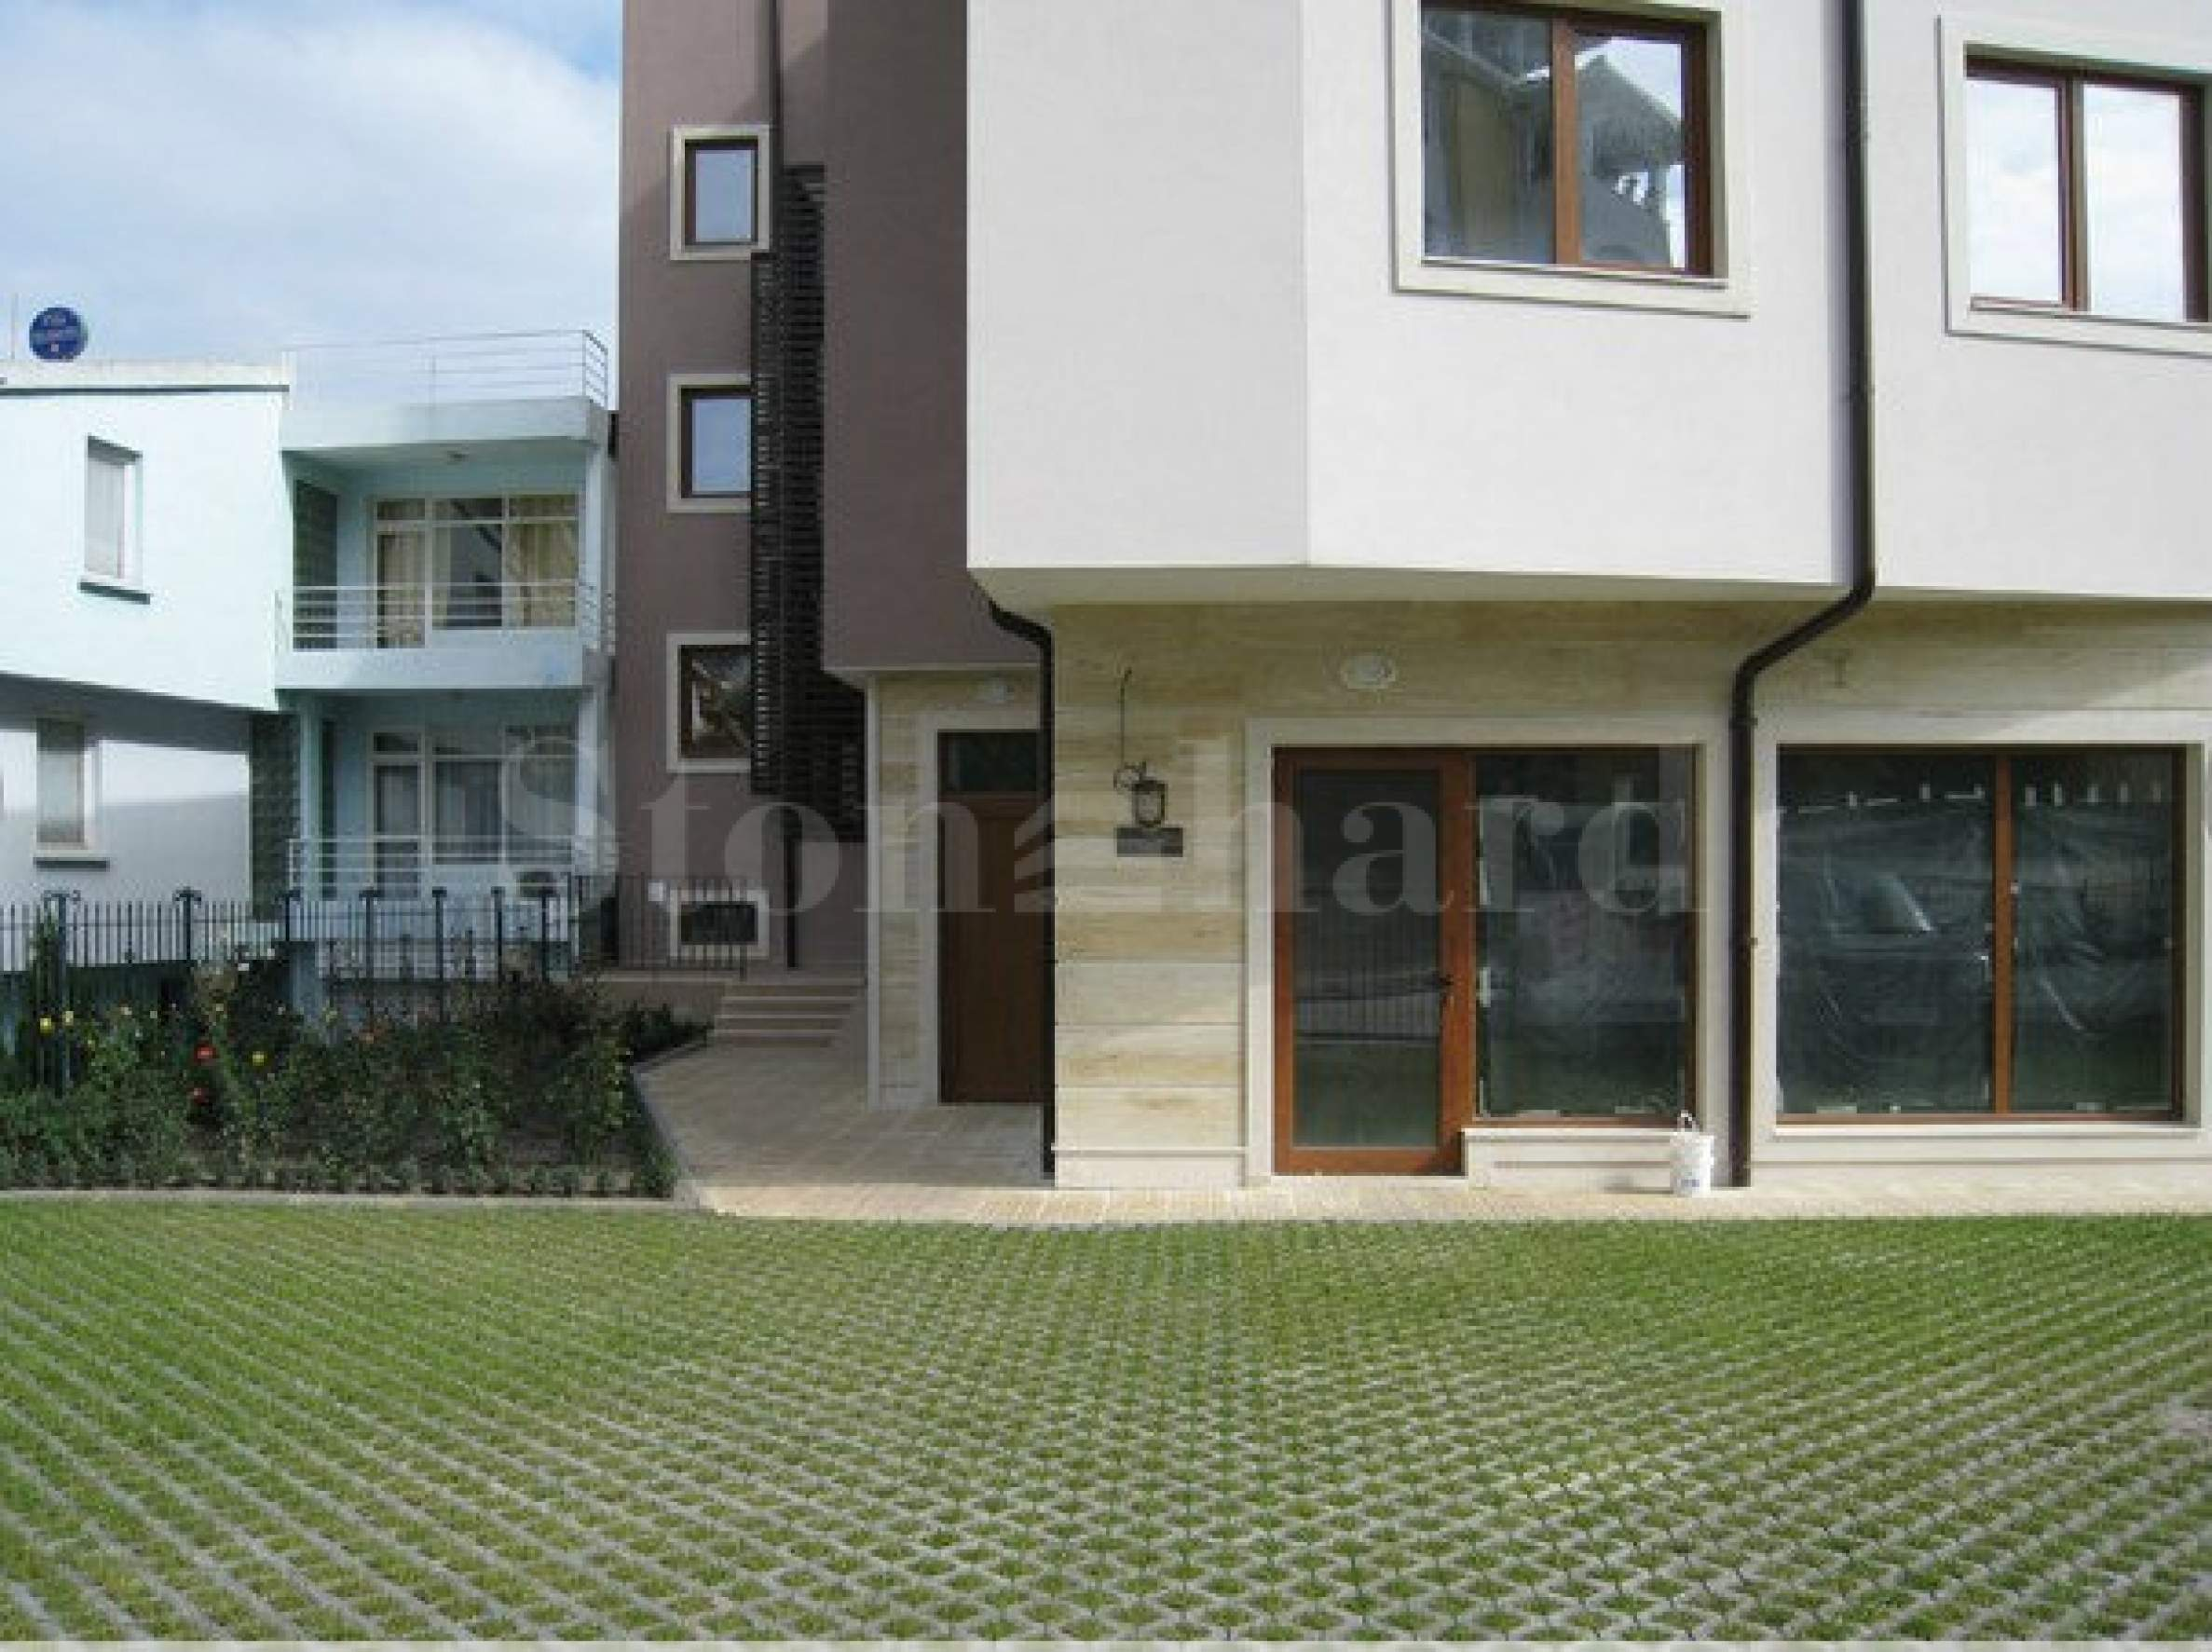 Панорамни апартаменти до ключ в м-т Евксиноград2 - Stonehard